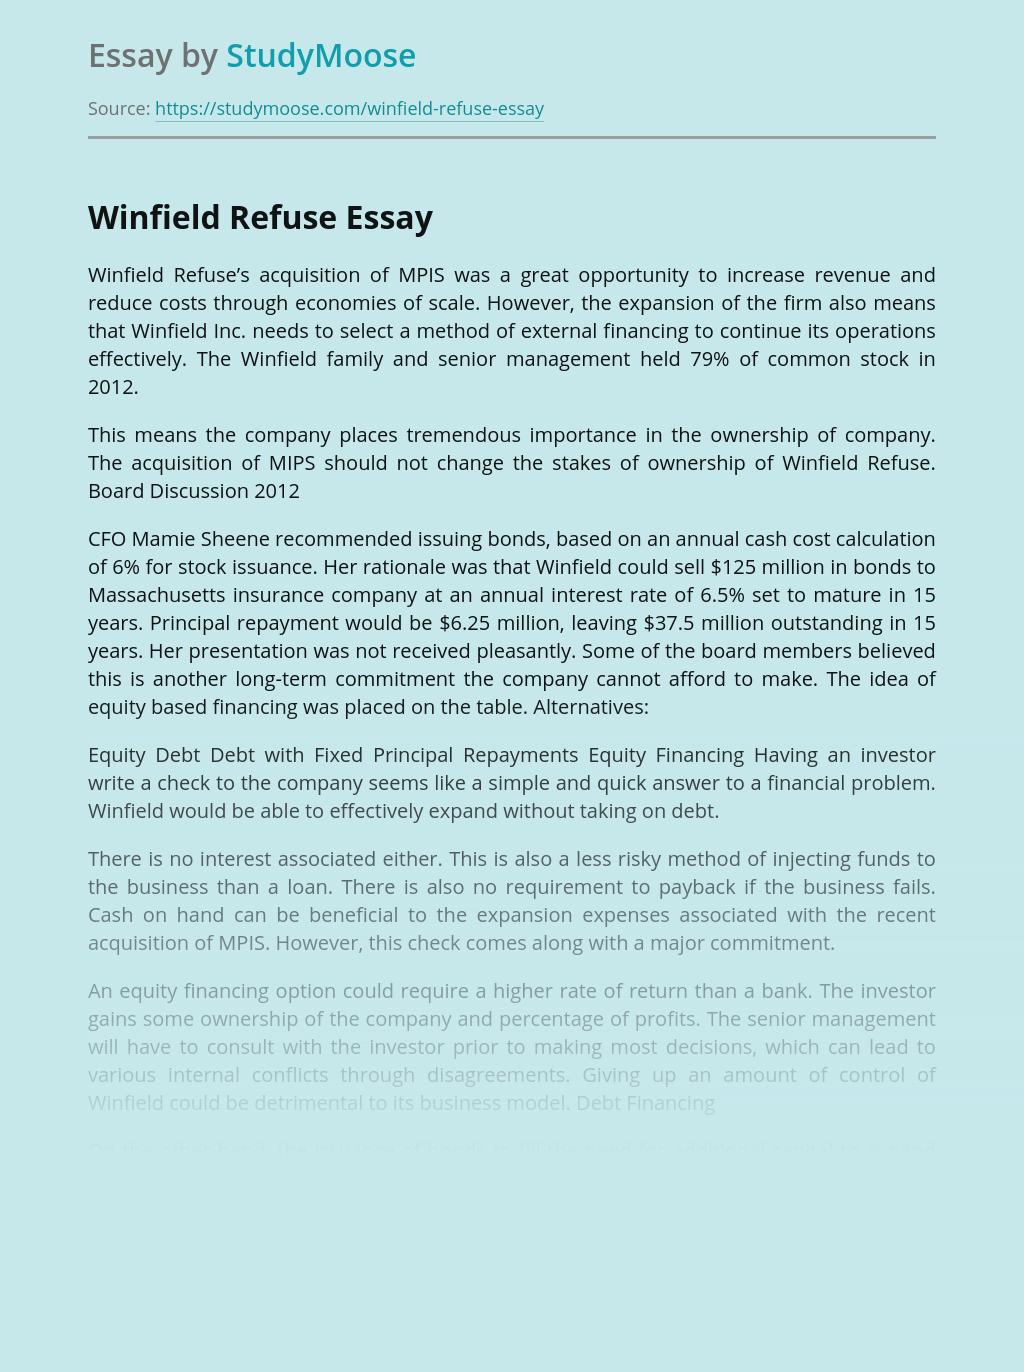 Winfield Refuse